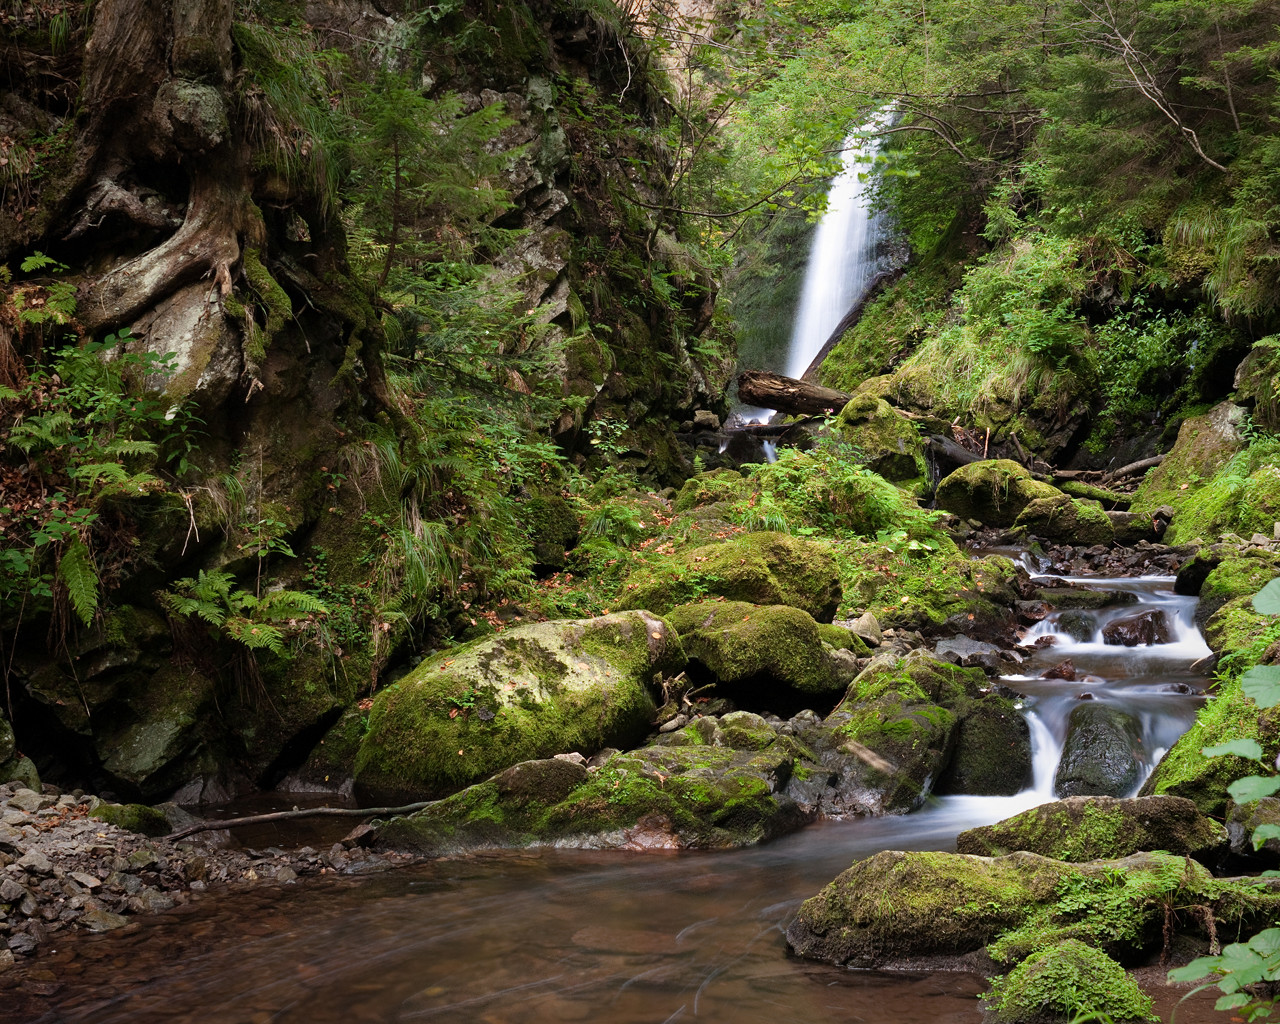 Jungle Waterfall Wallpaper Hd: Jungle Desktop Wallpaper